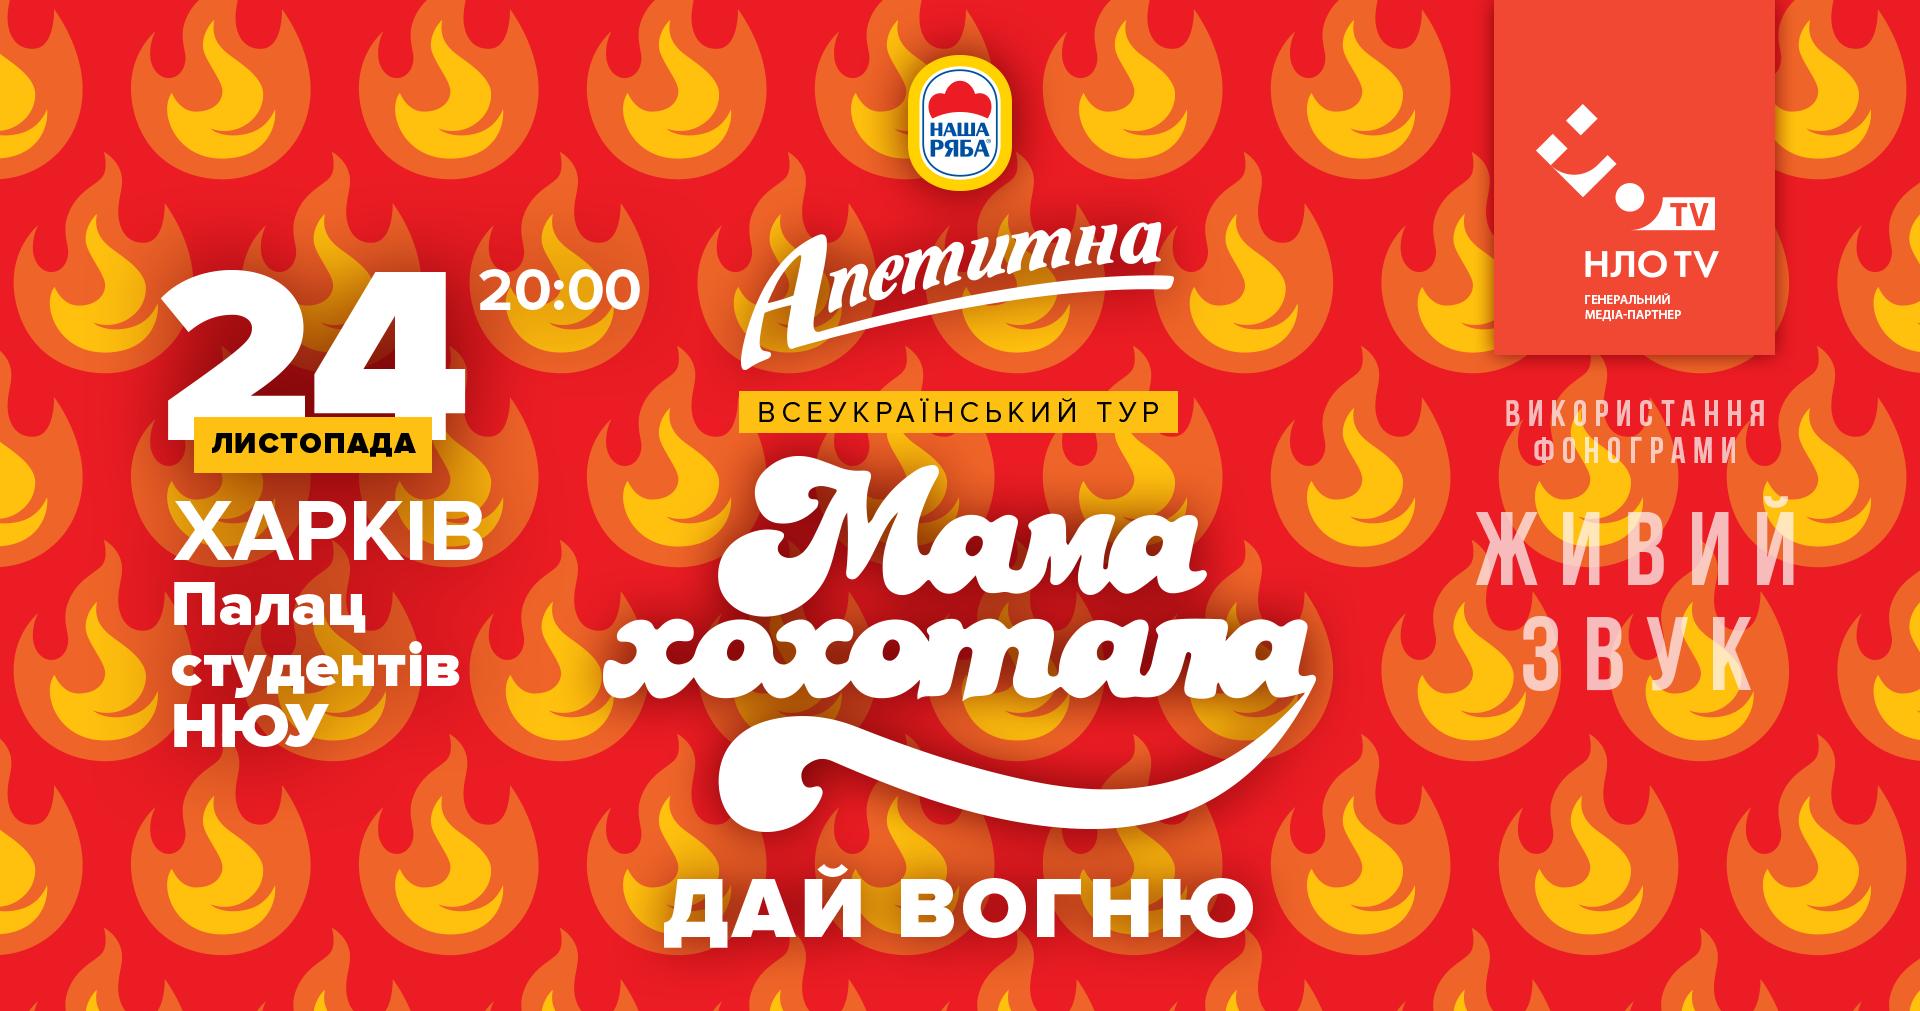 У Харкові Всеукраїнський тур МАМАХОХОТАЛА ДАЙ ВОГНЮ (24.11)